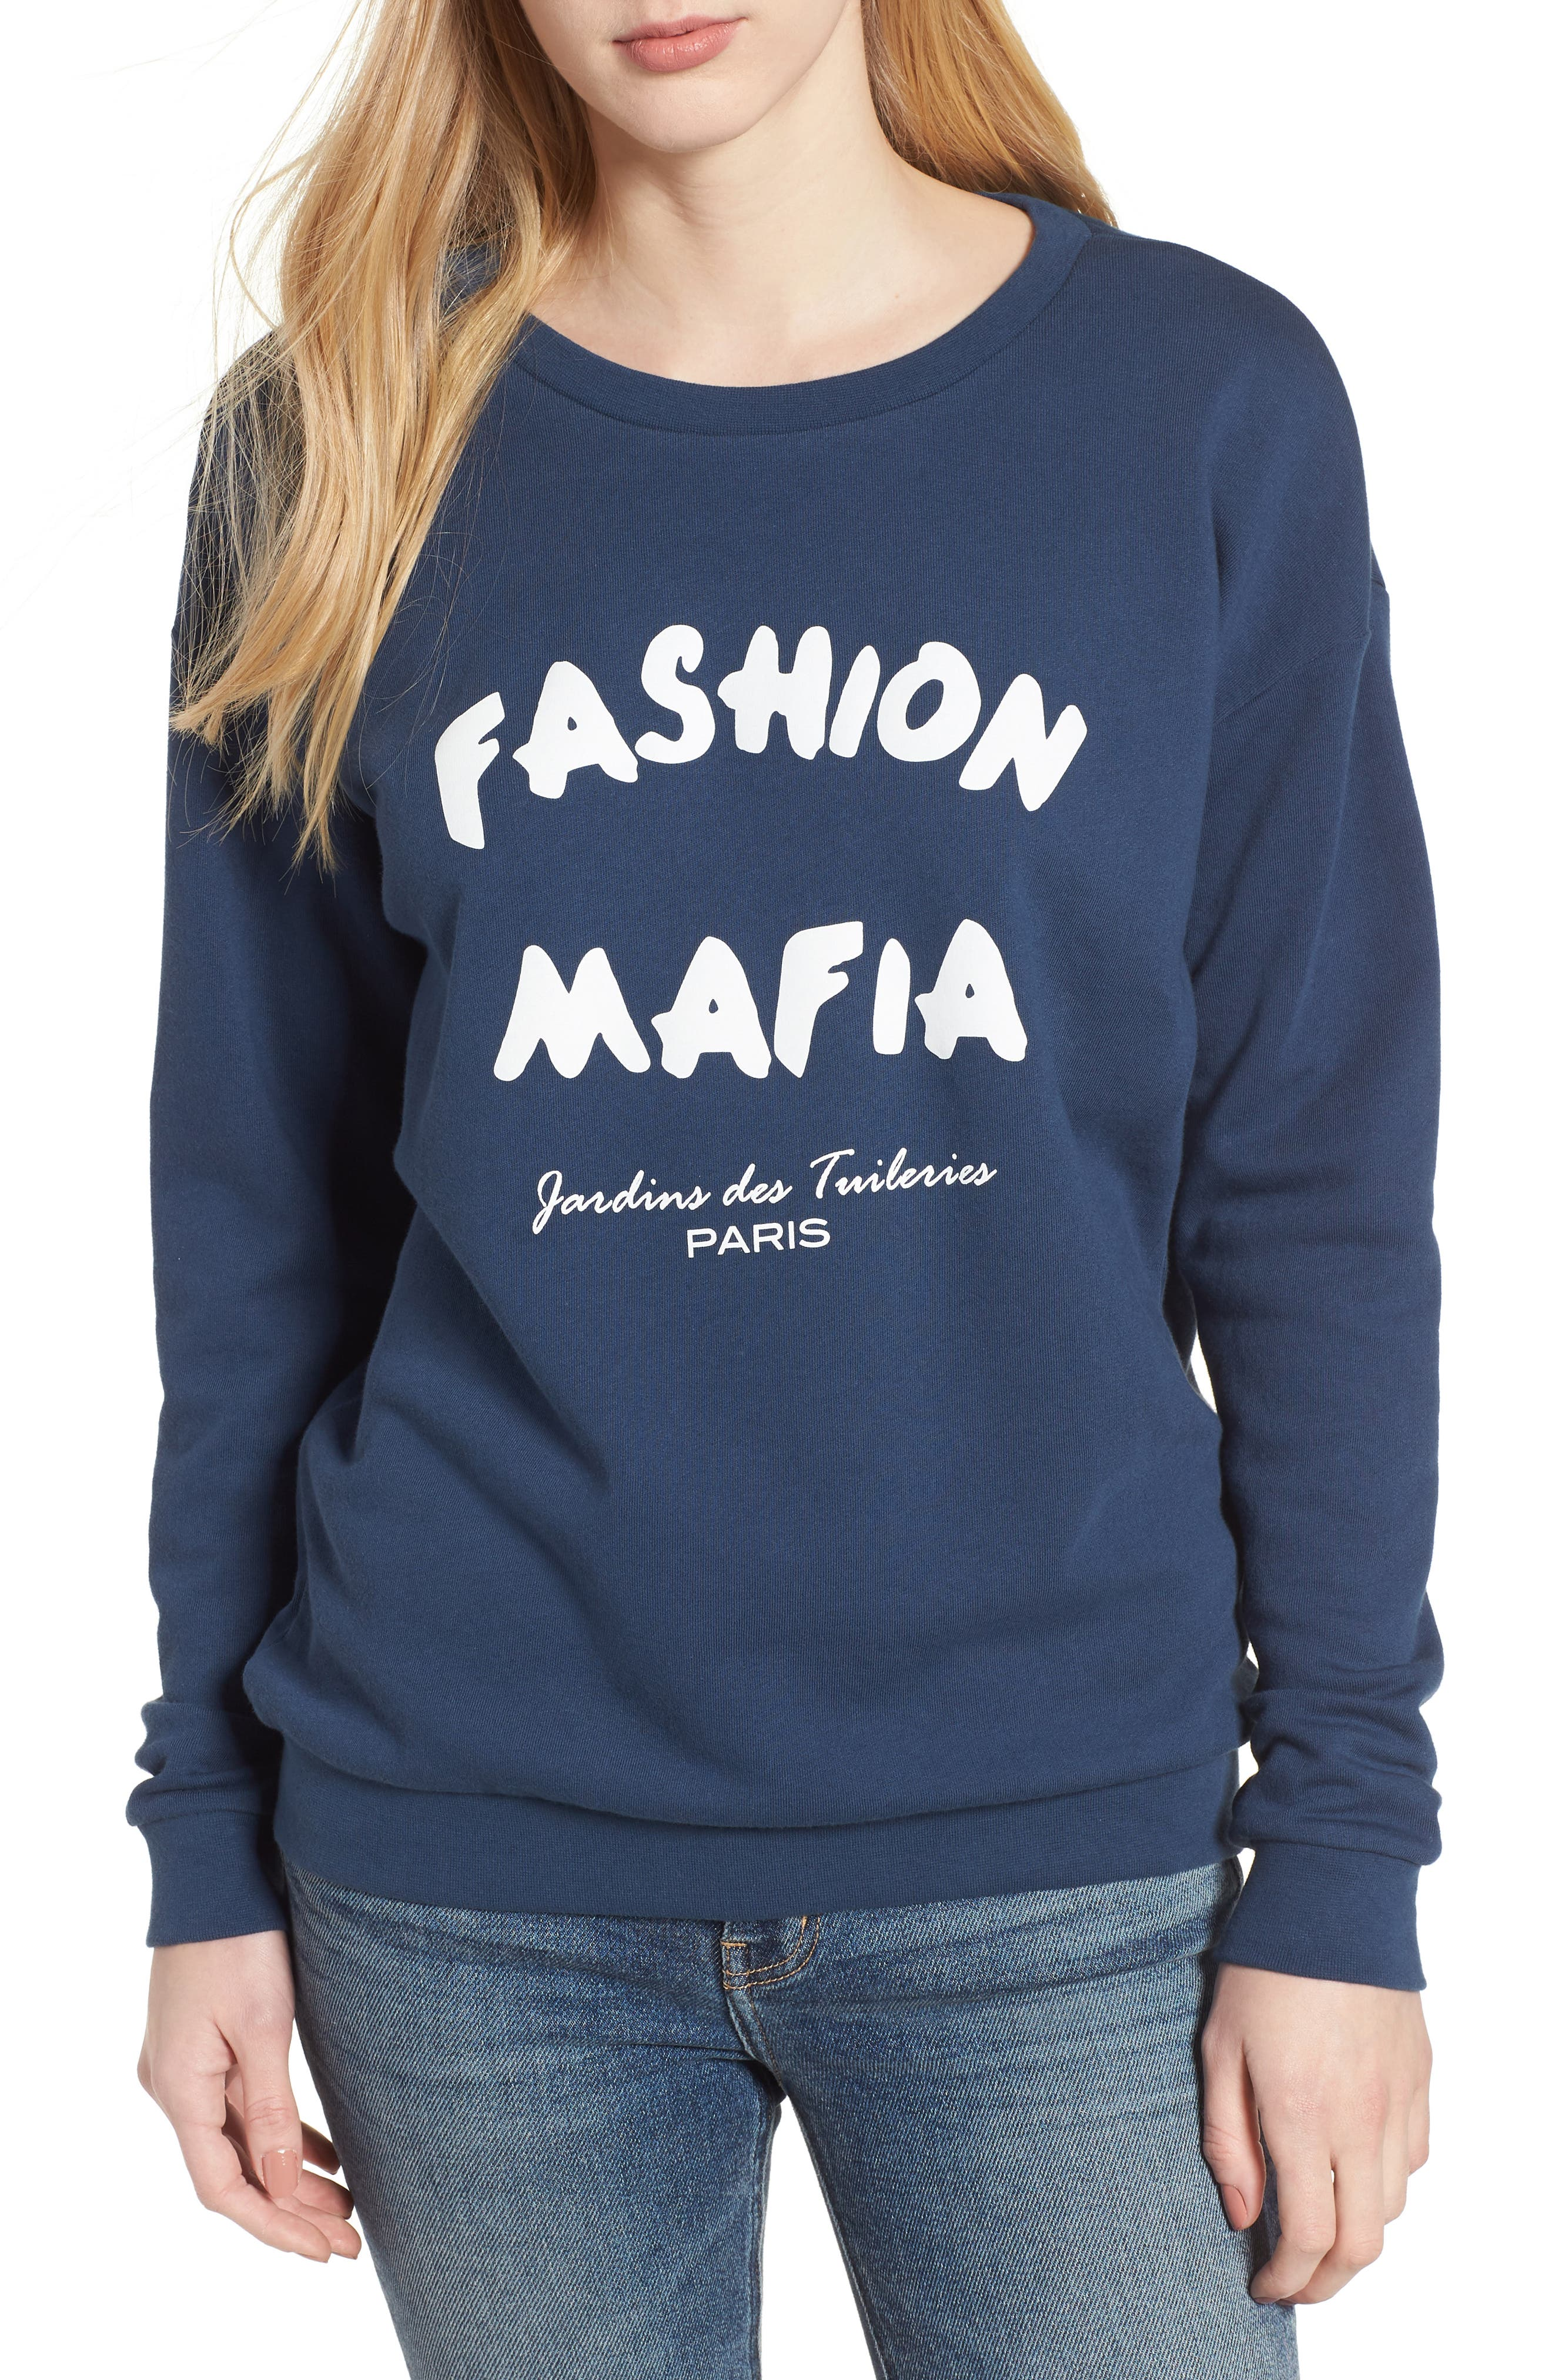 Alexa - Fashion Mafia Sweatshirt,                         Main,                         color, 400